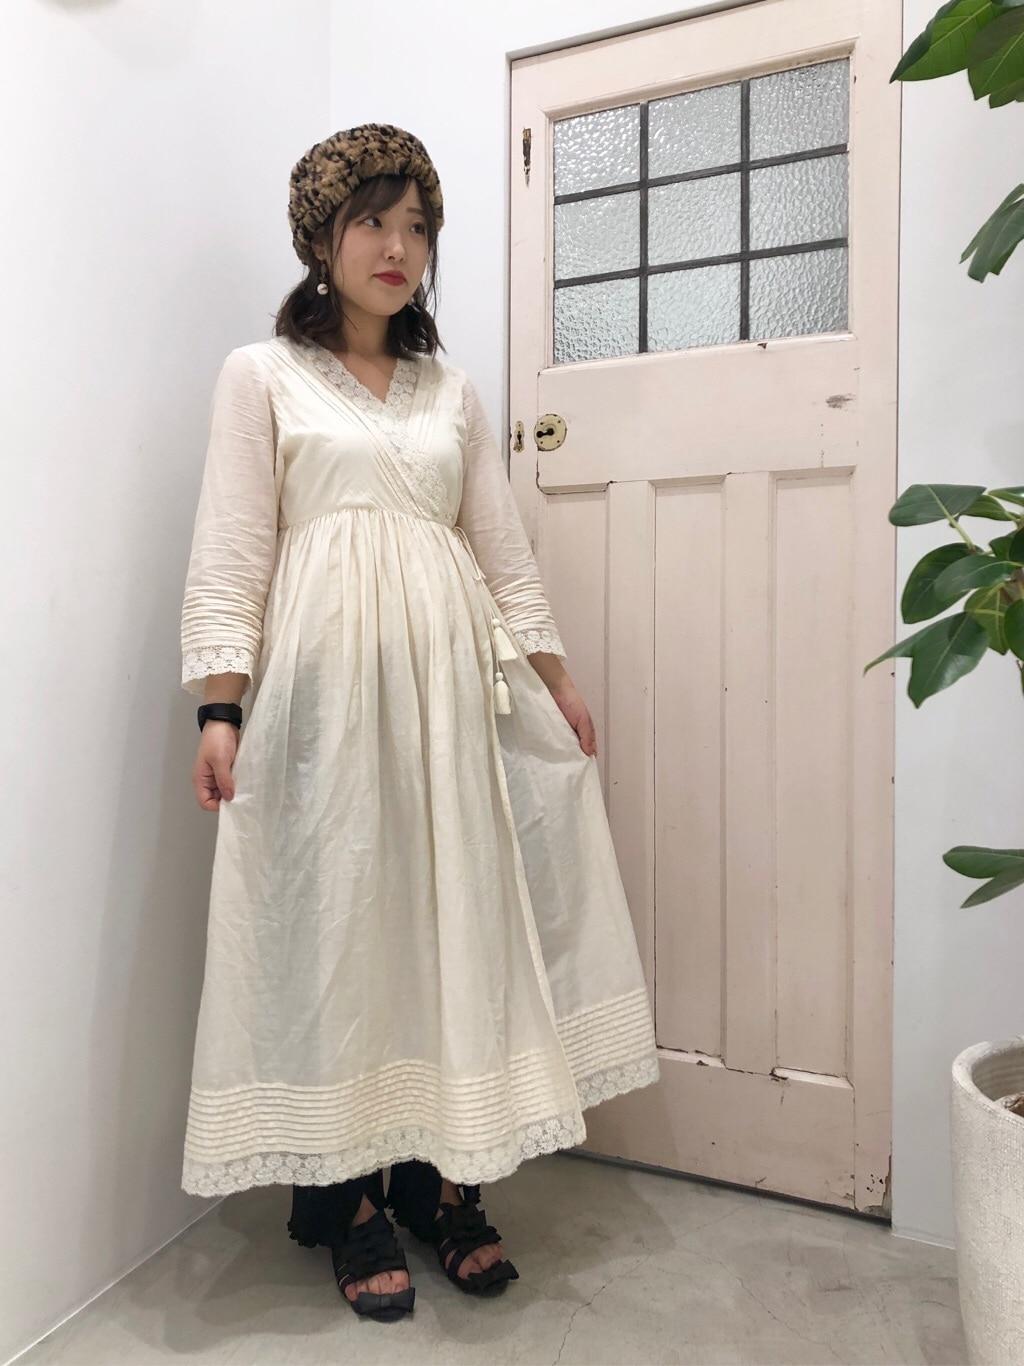 Dot and Stripes CHILD WOMAN ペリエ千葉 身長:160cm 2019.08.29